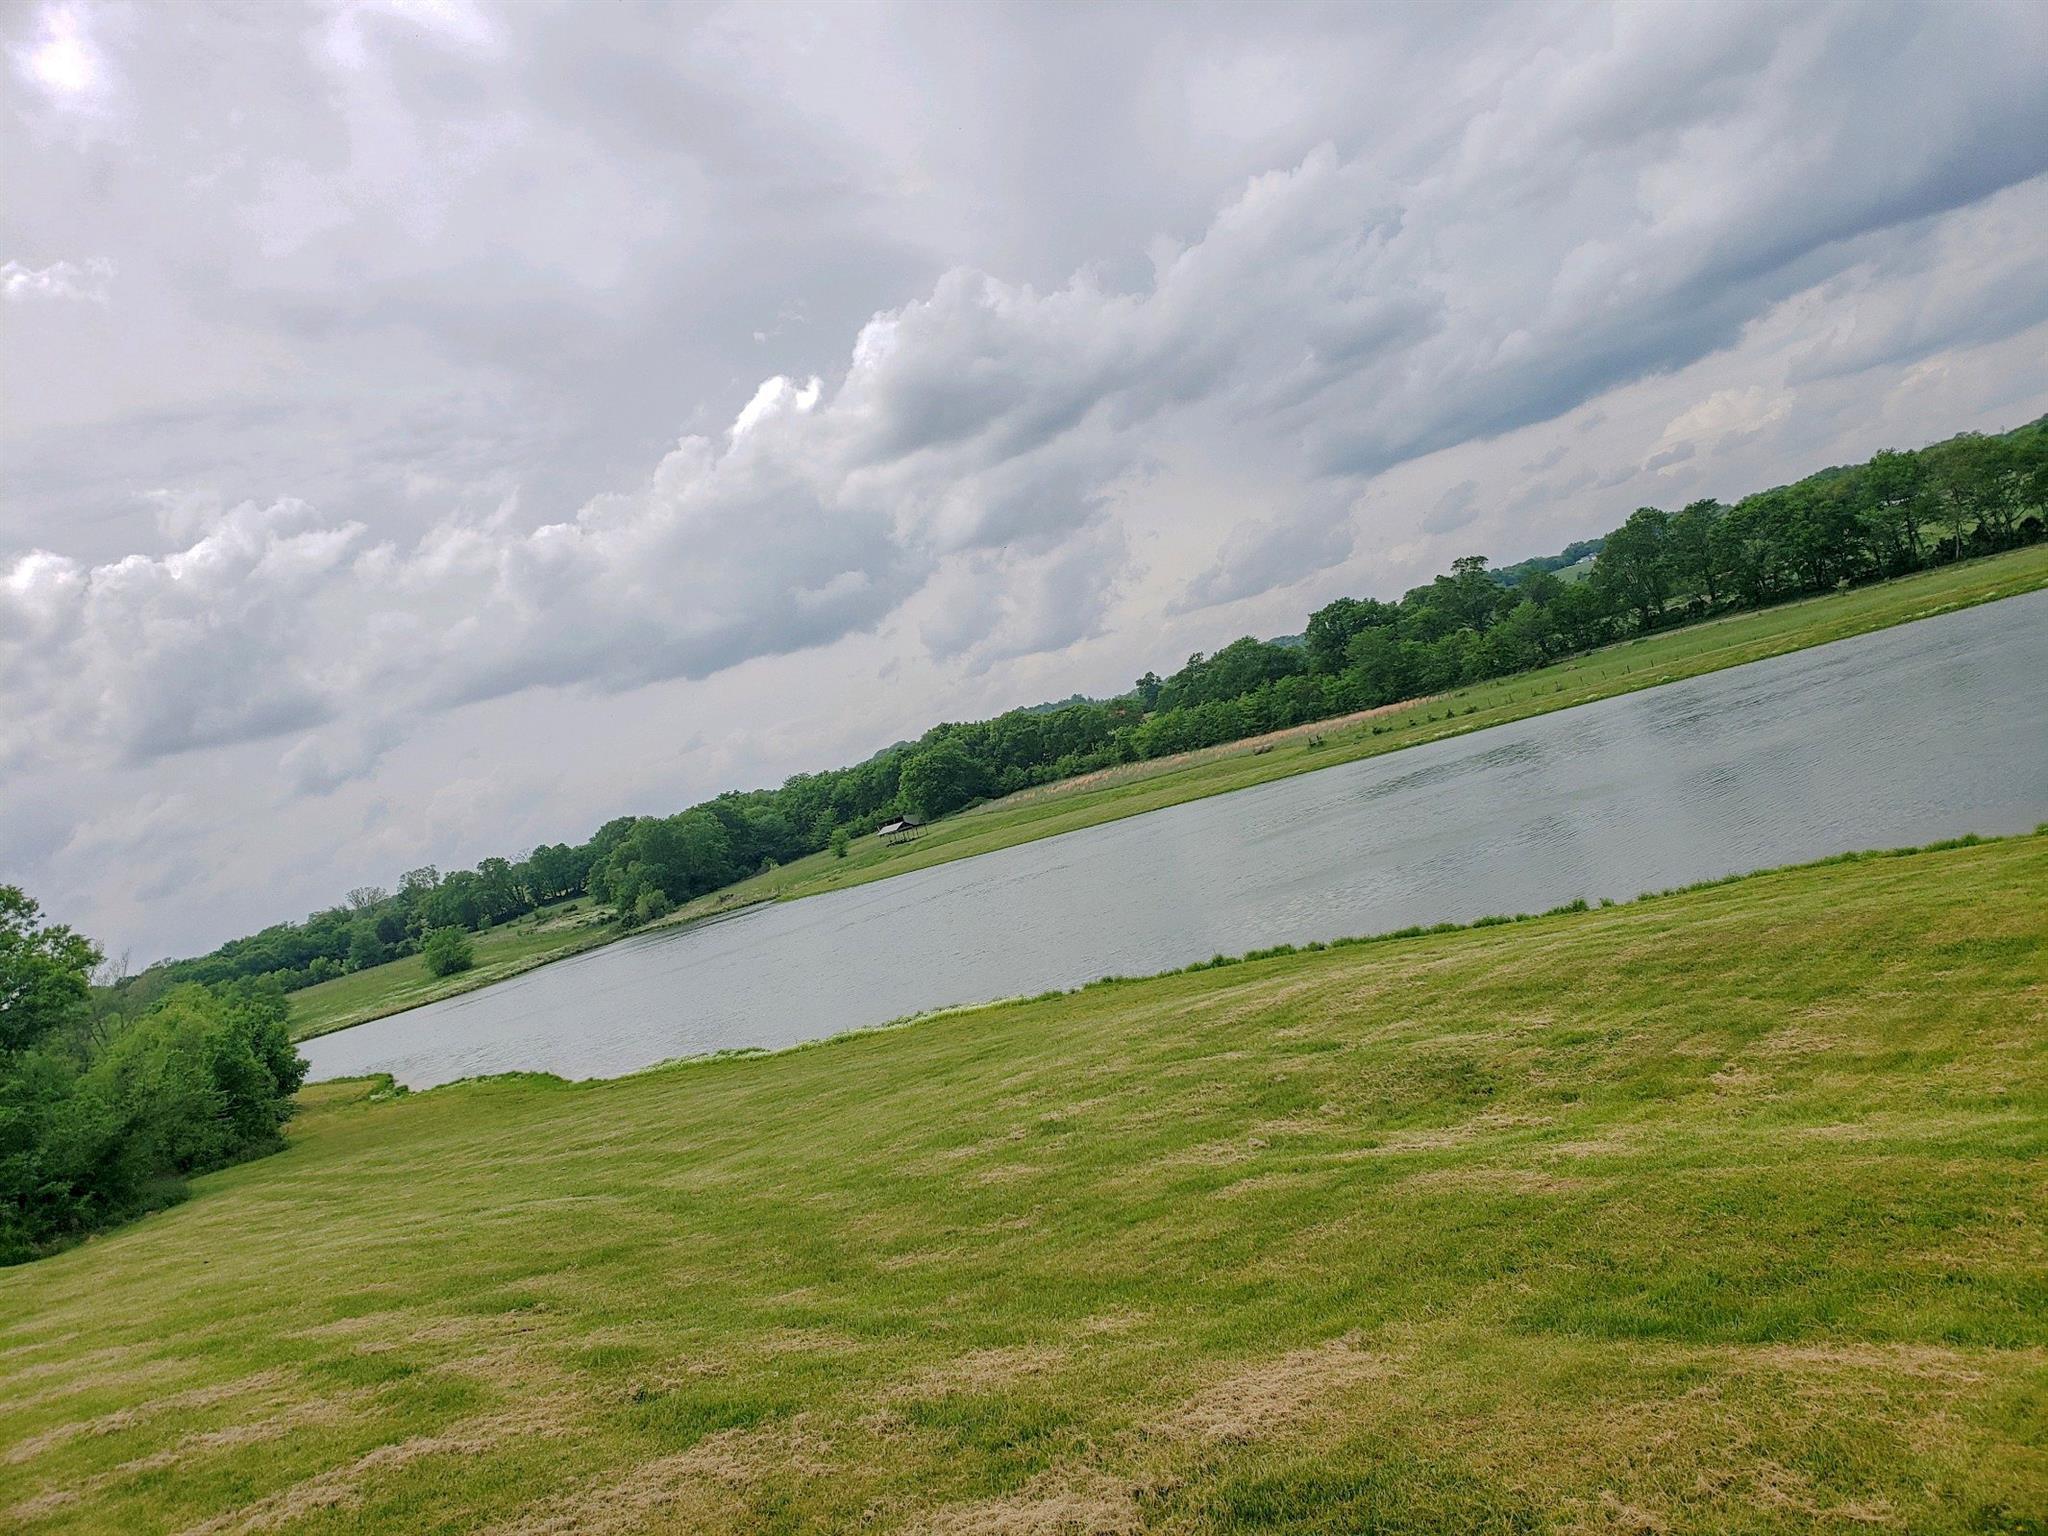 541 Upper Station Camp Crk Rd, Gallatin, TN 37066 - Gallatin, TN real estate listing